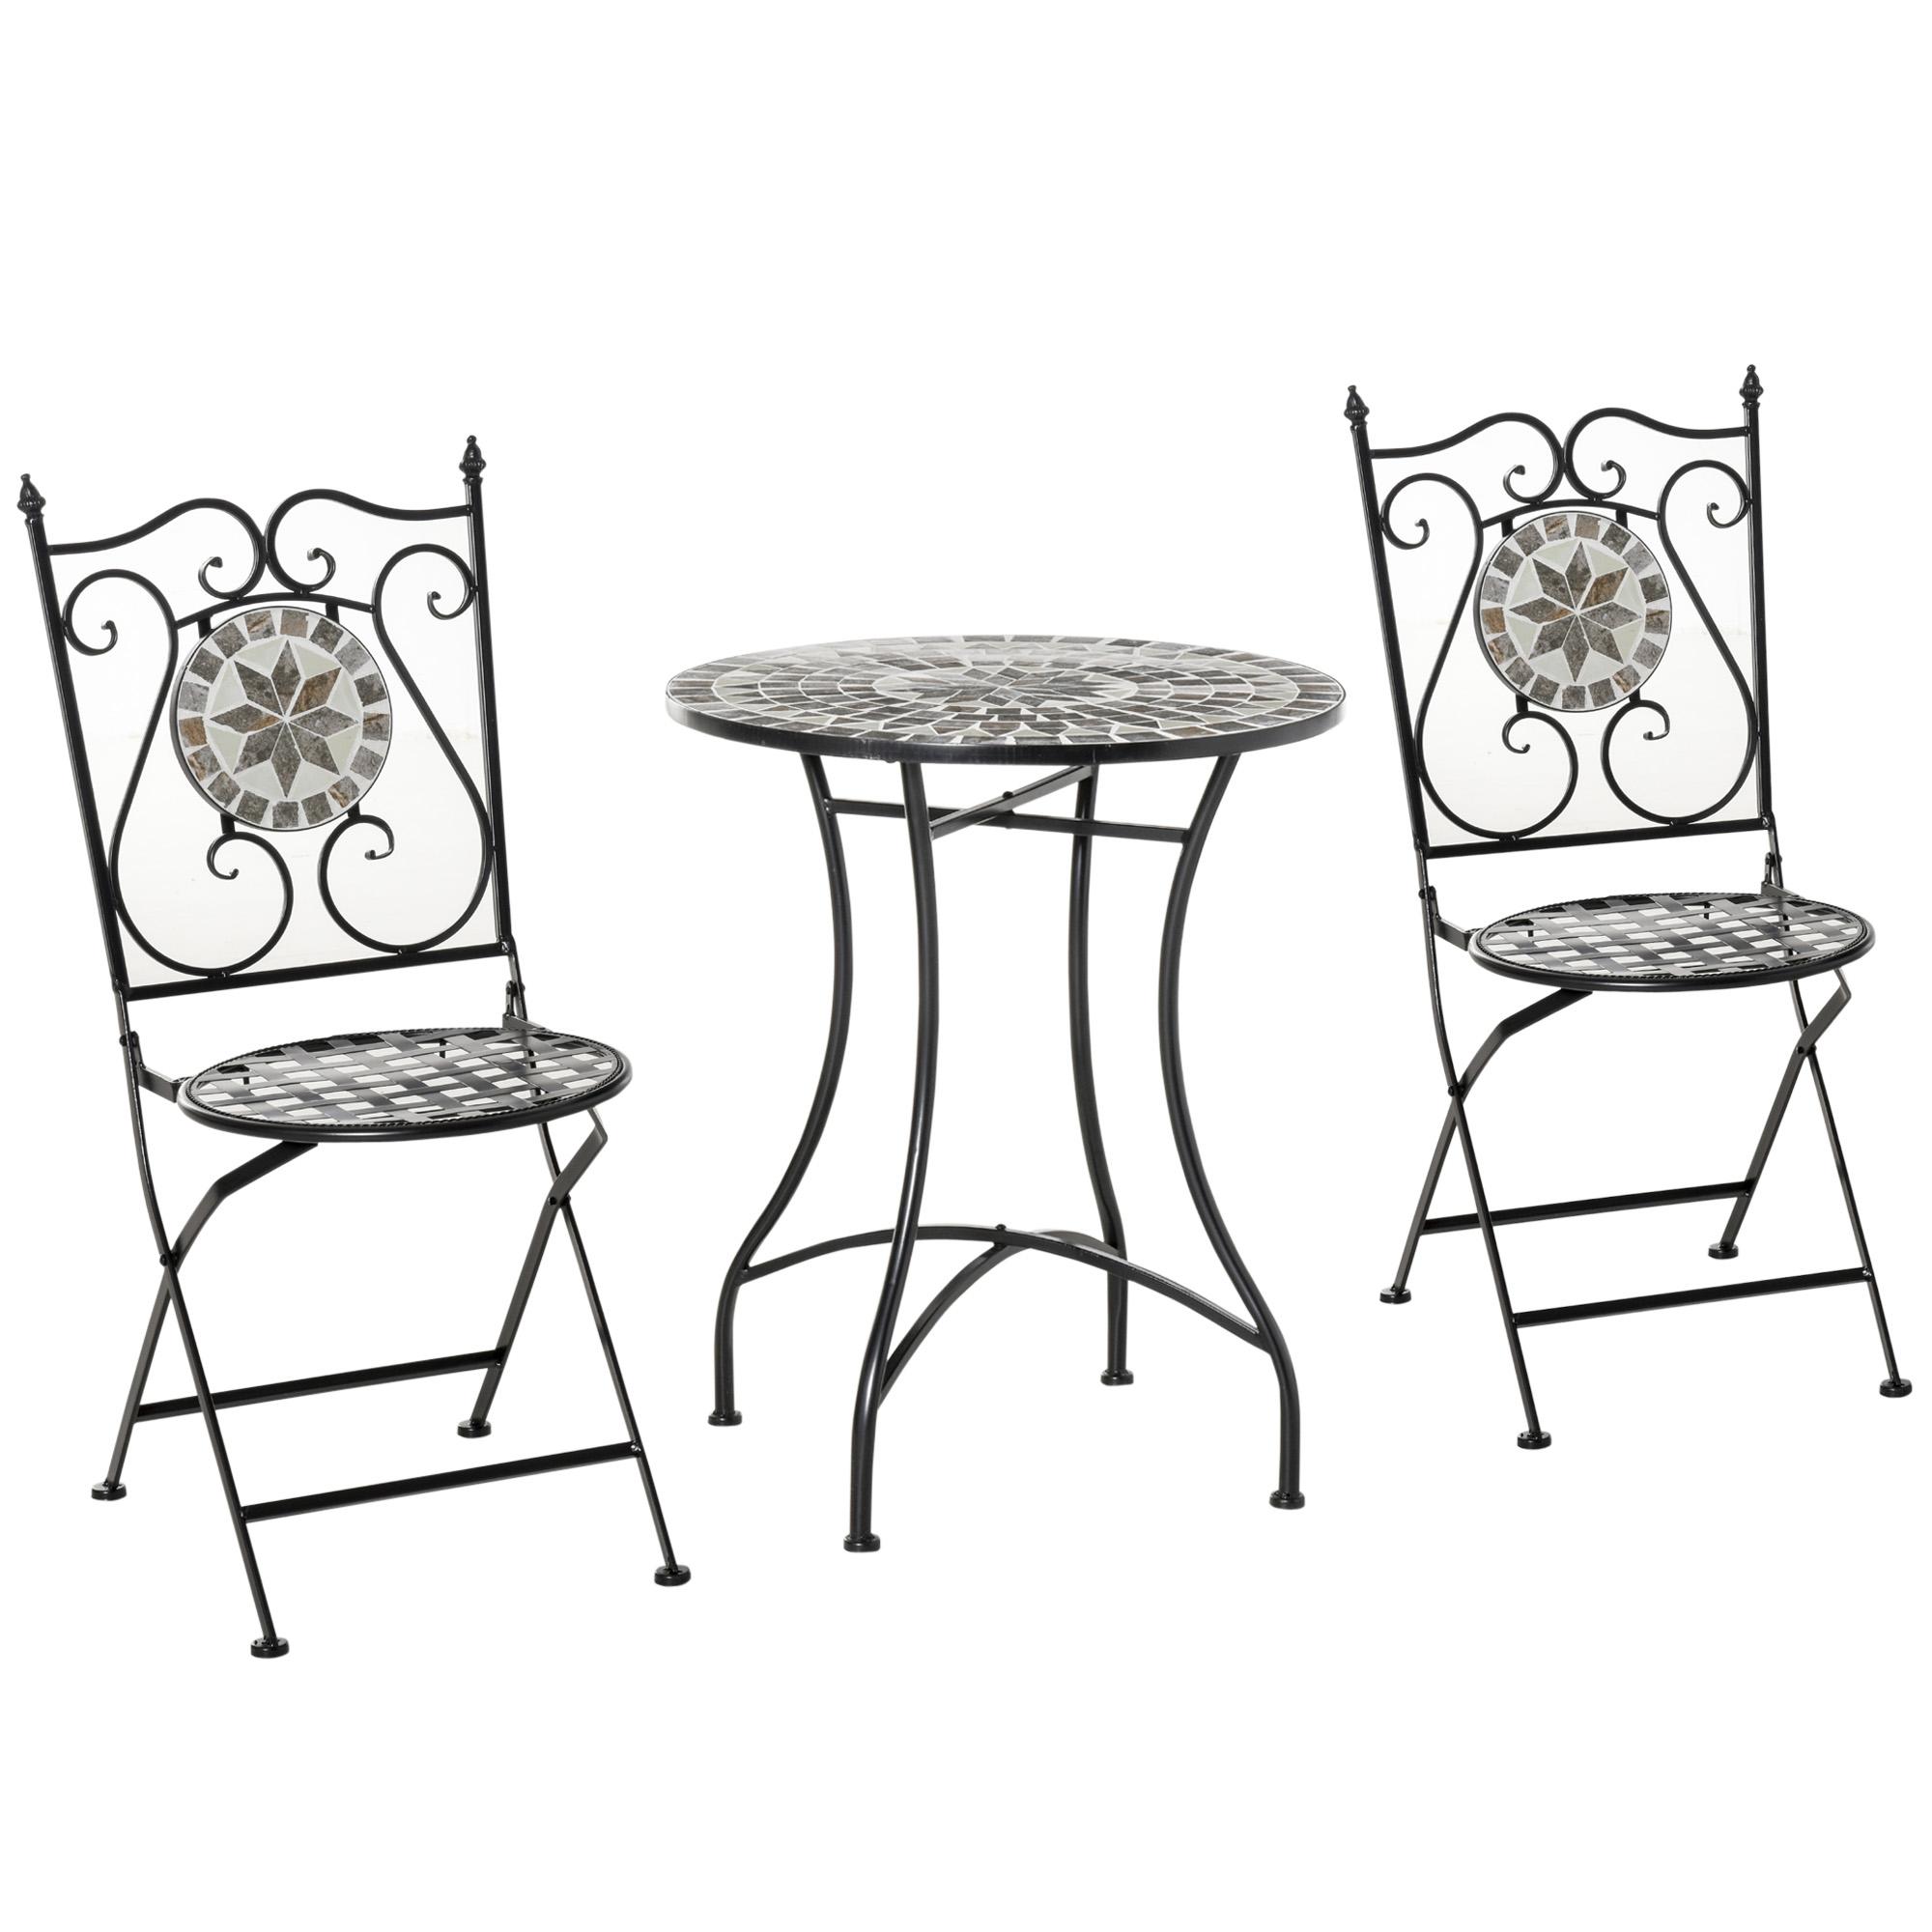 Outsunny 3 Pcs Mosaic Tile Garden Bistro Set Outdoor Seating w/ Table 2 Folding Chairs Set Metal Frame Elegant Scrolling   Aosom Ireland